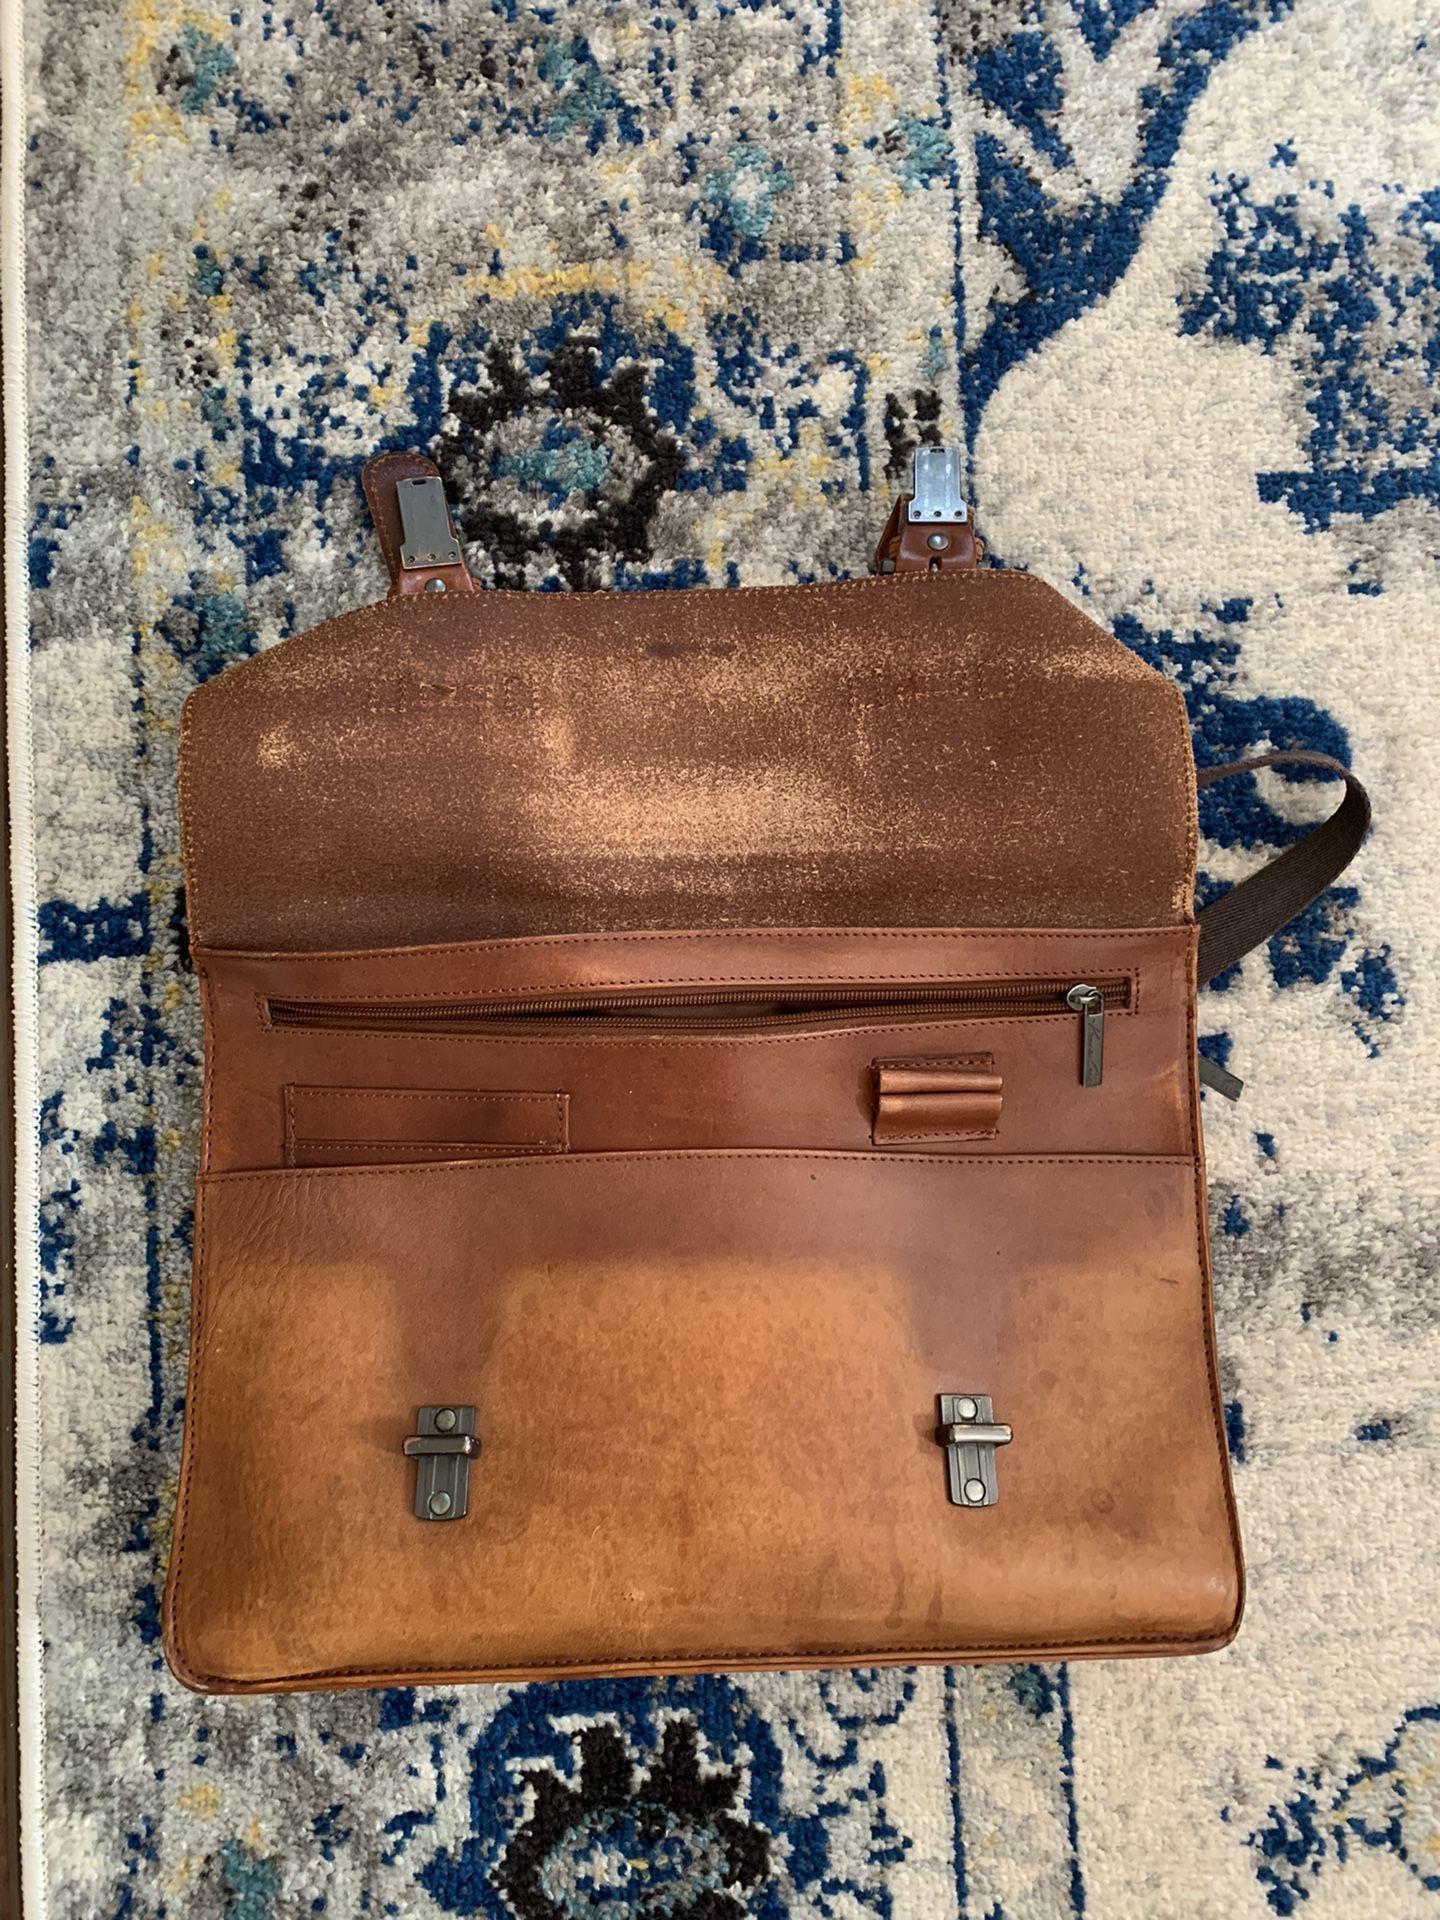 Kenneth Cole Men's Portfolio Bag